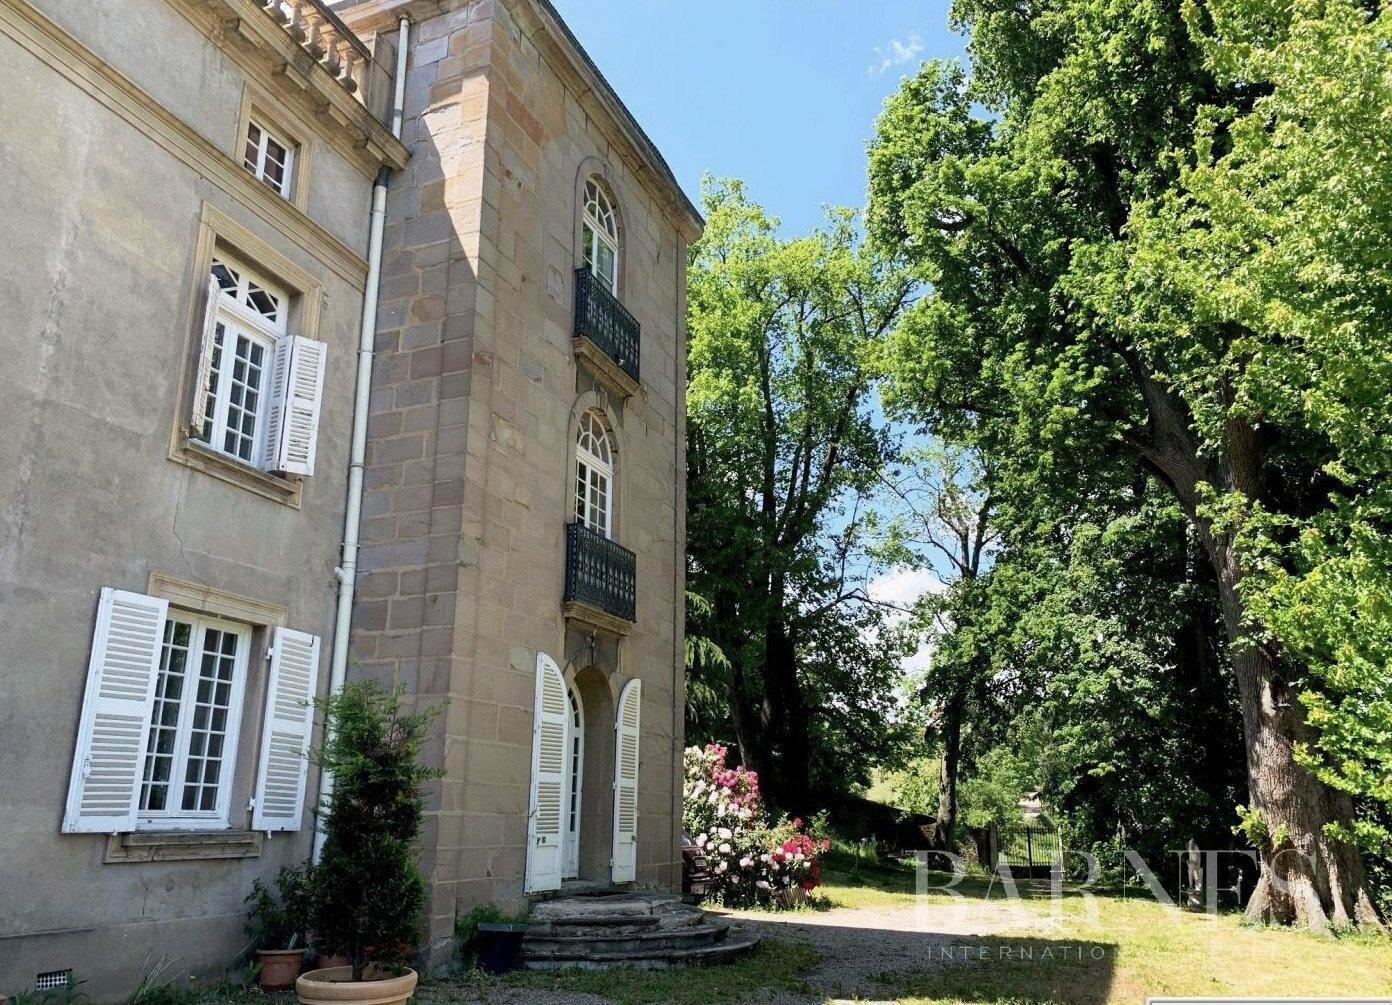 Castle in La Ricamarie, Auvergne-Rhône-Alpes, France 1